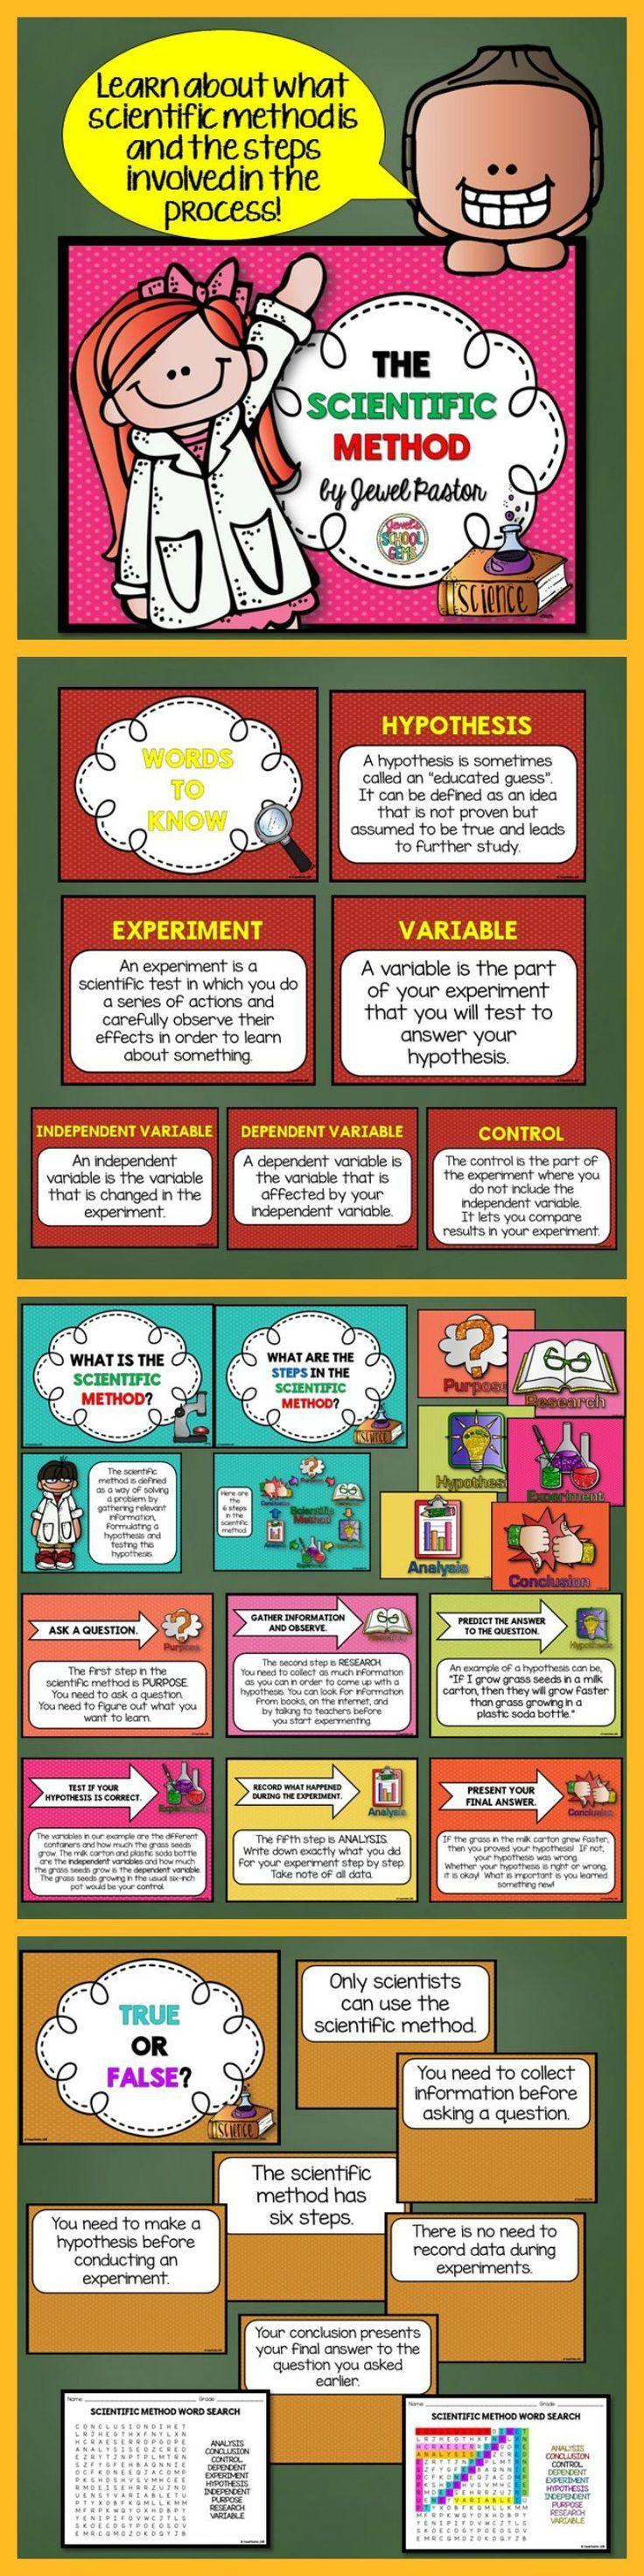 Scientific Method Activities Scientific Method Powerpoint Scientific Method Scientific Method Activities Science Teaching Resources